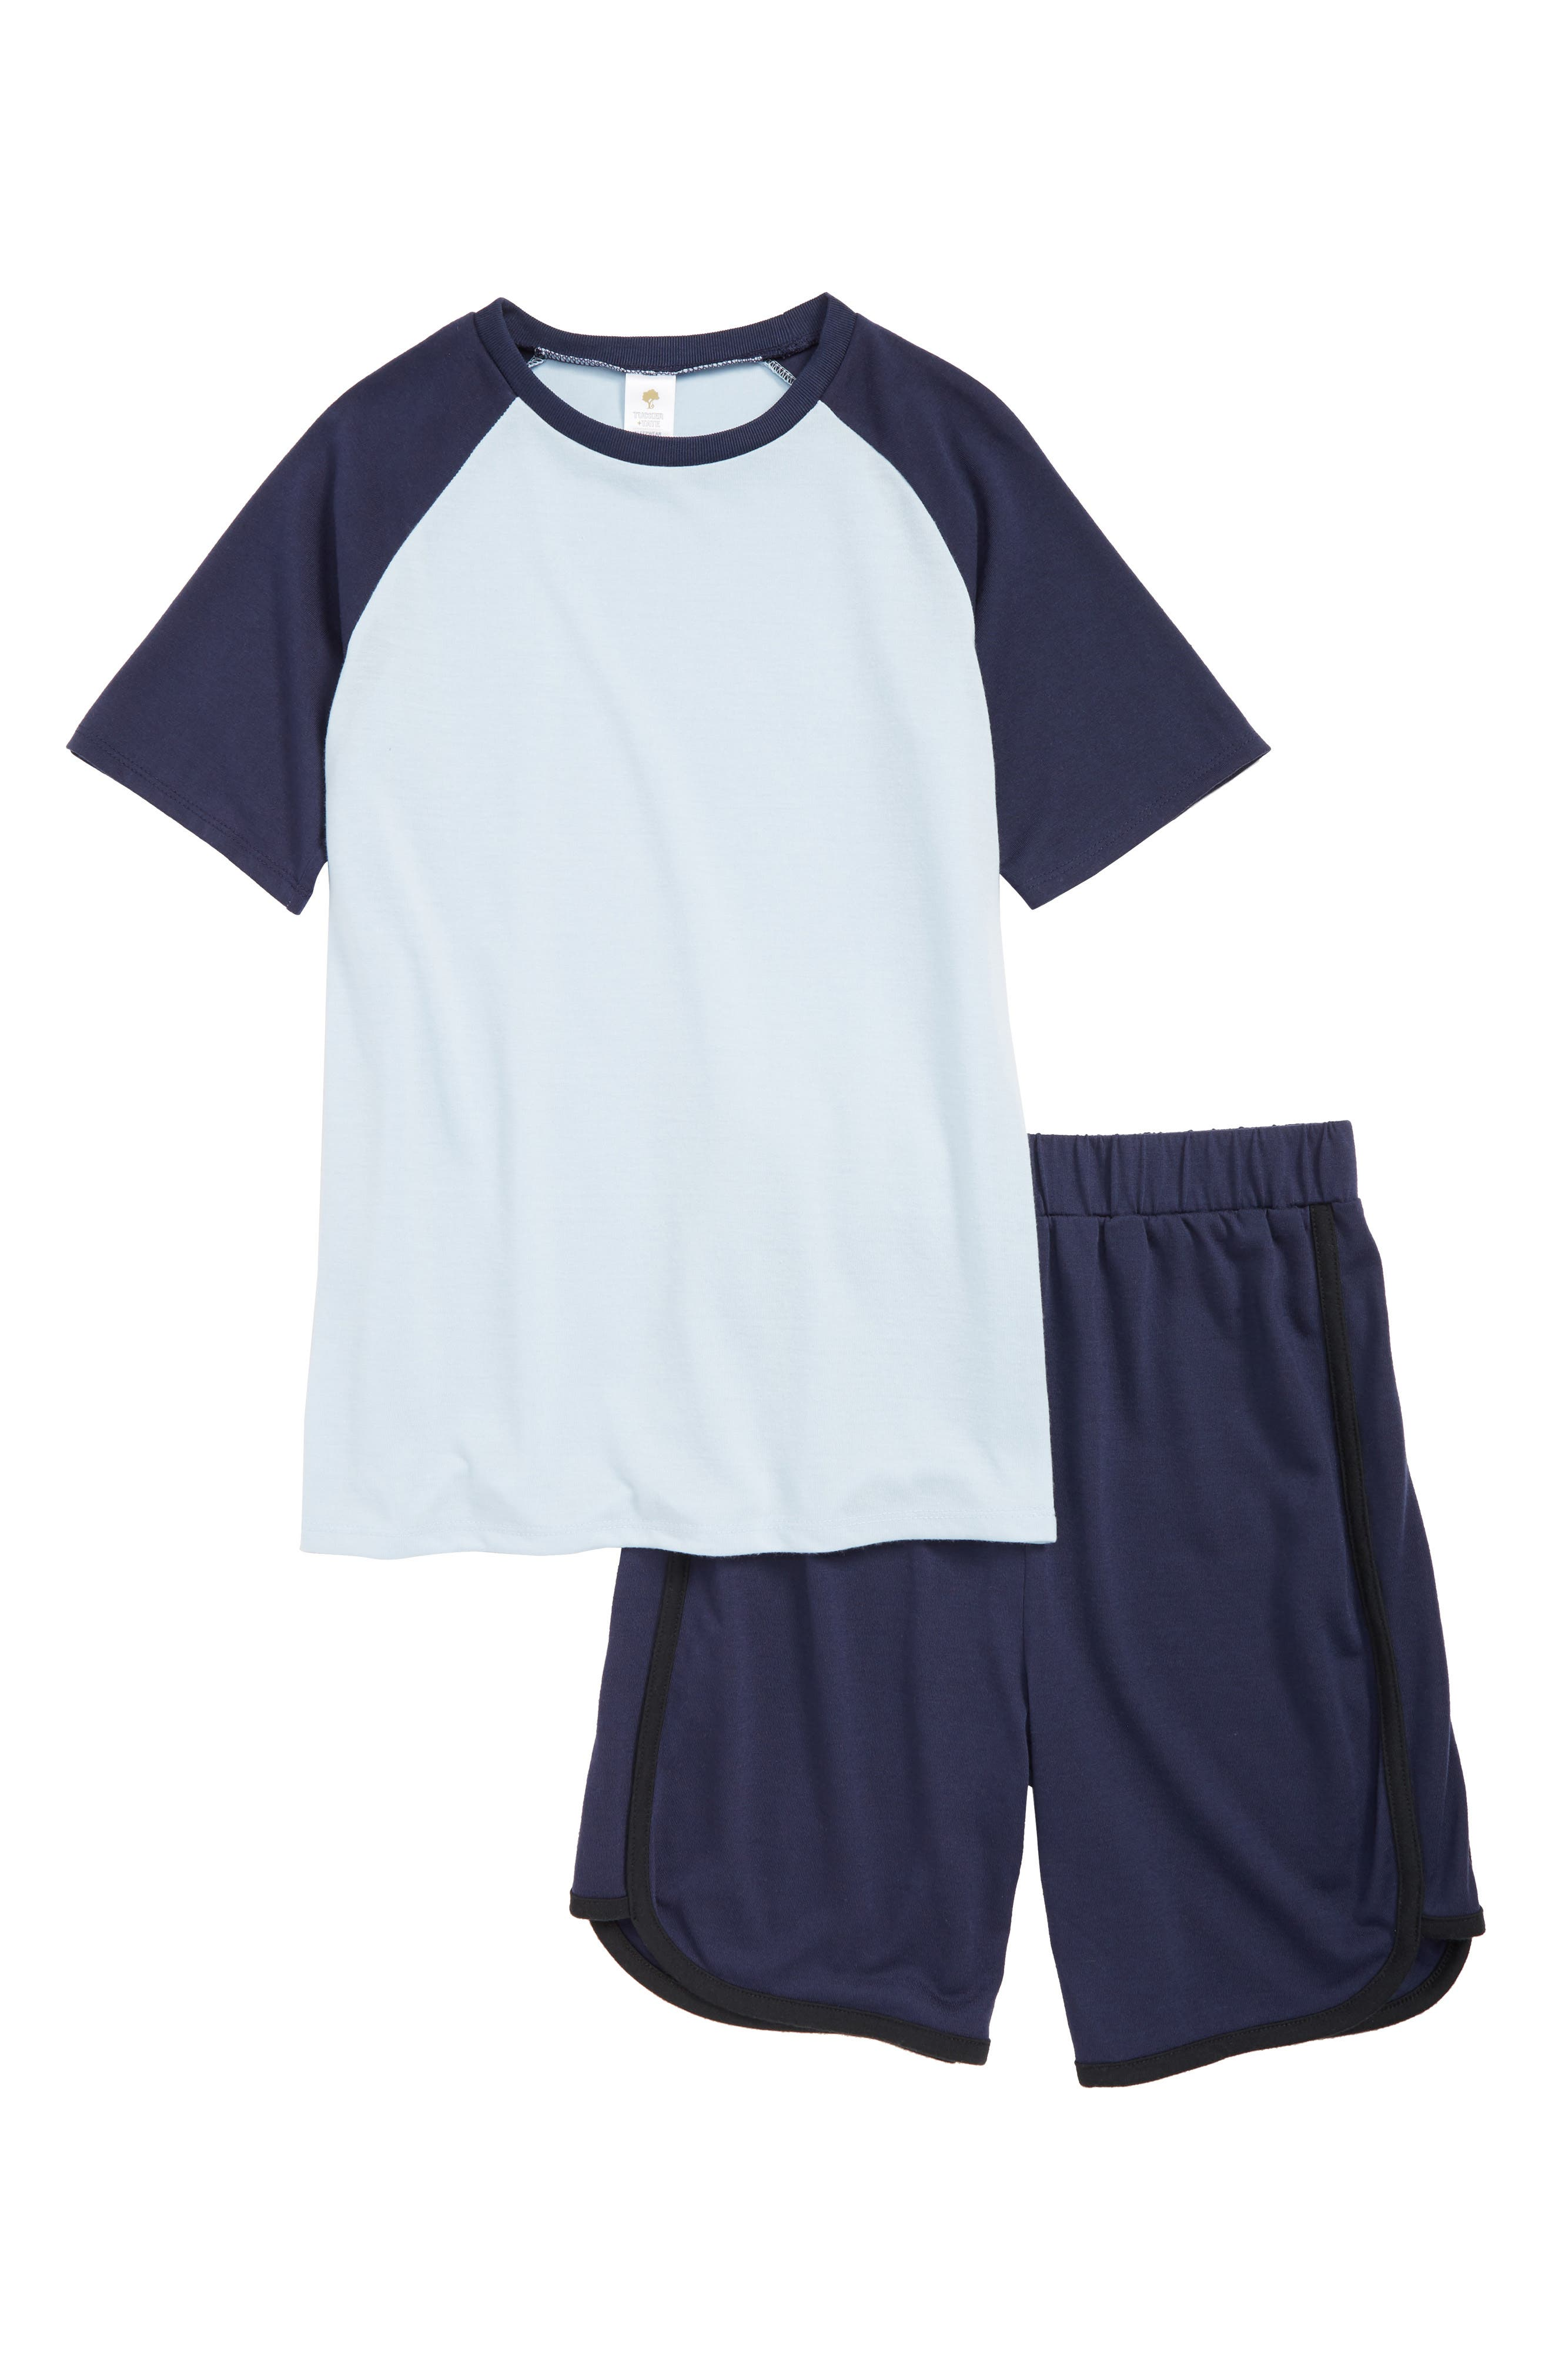 TUCKER + TATE,                             Sporty Top & Shorts Set,                             Main thumbnail 1, color,                             NAVY PEACOAT